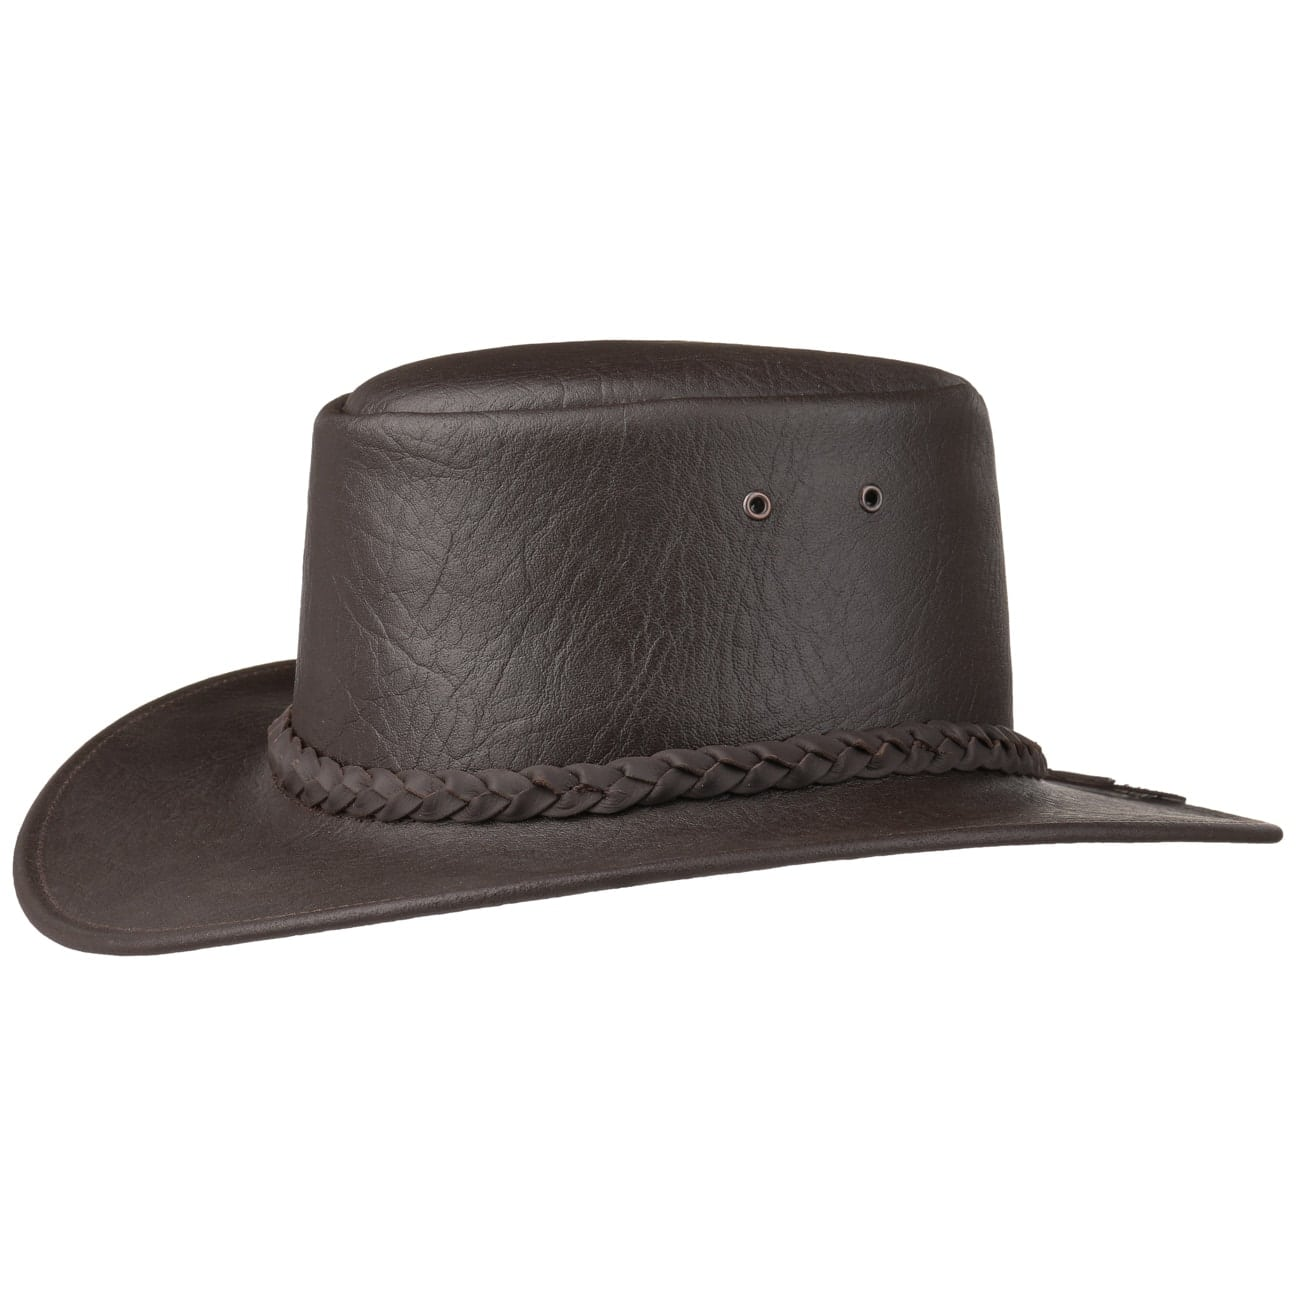 Sombrero de Piel Basic by Kakadu Traders  sombrero outback